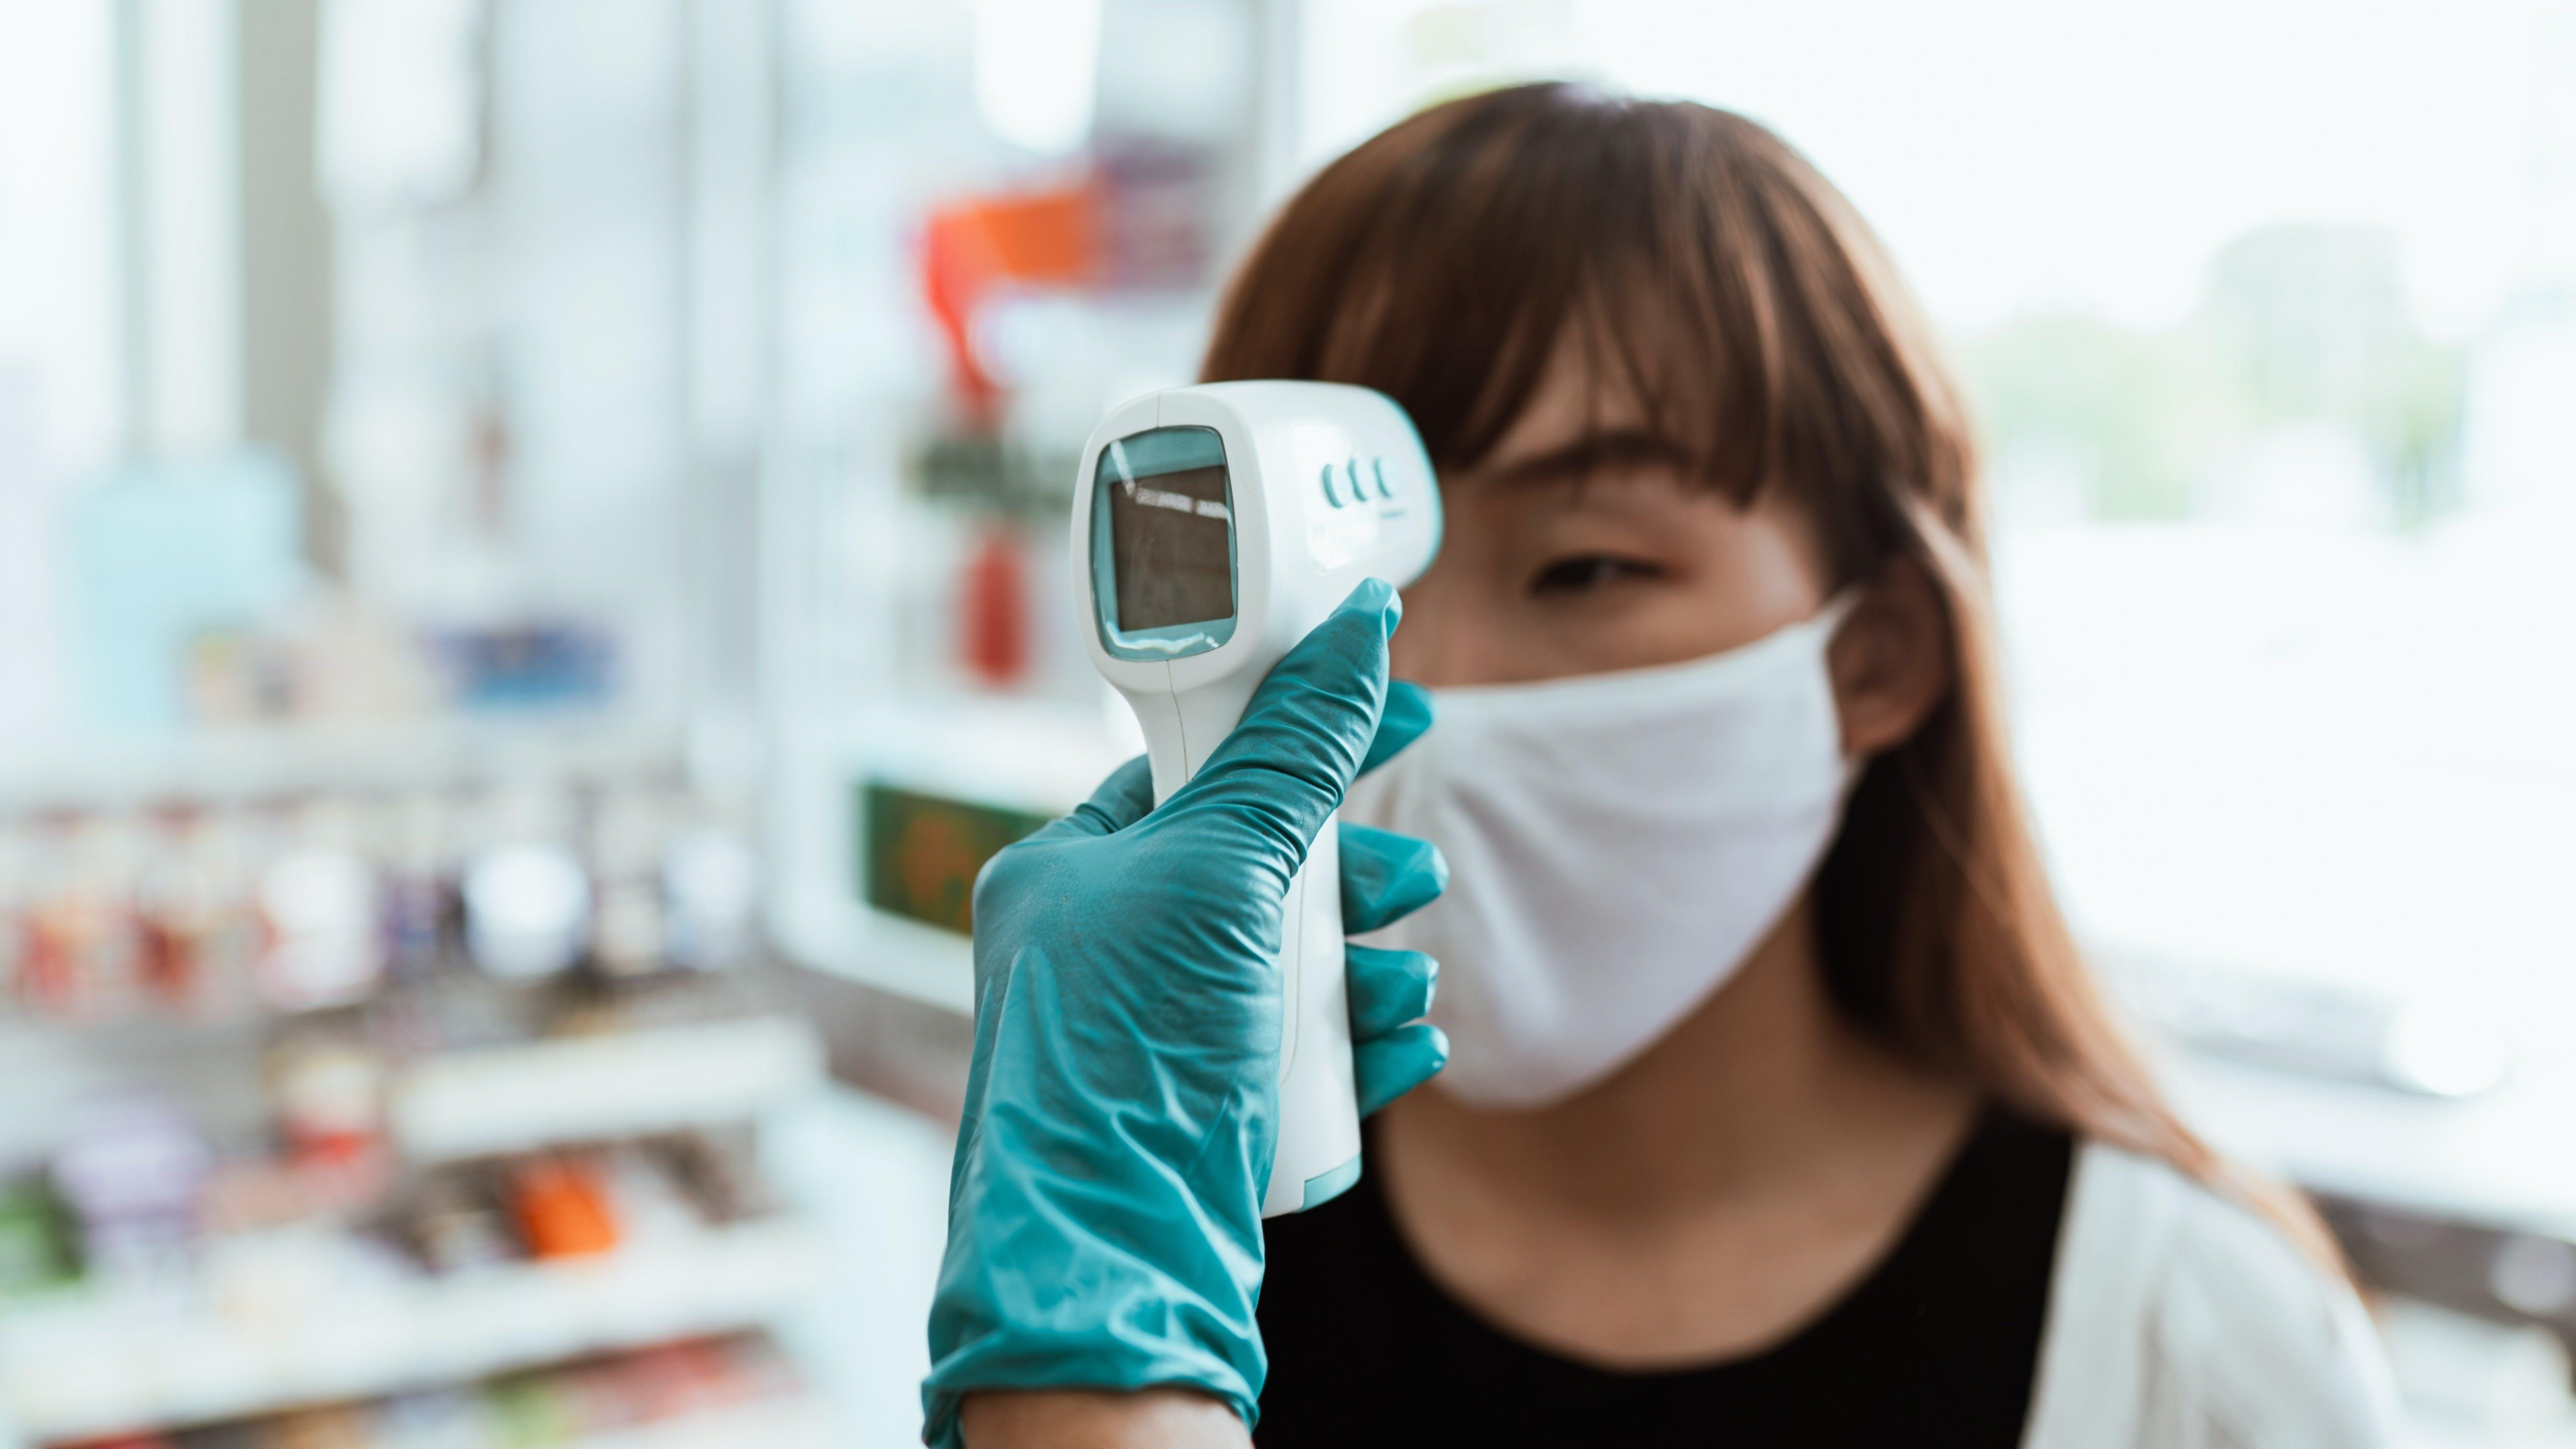 Woman having temperature checked